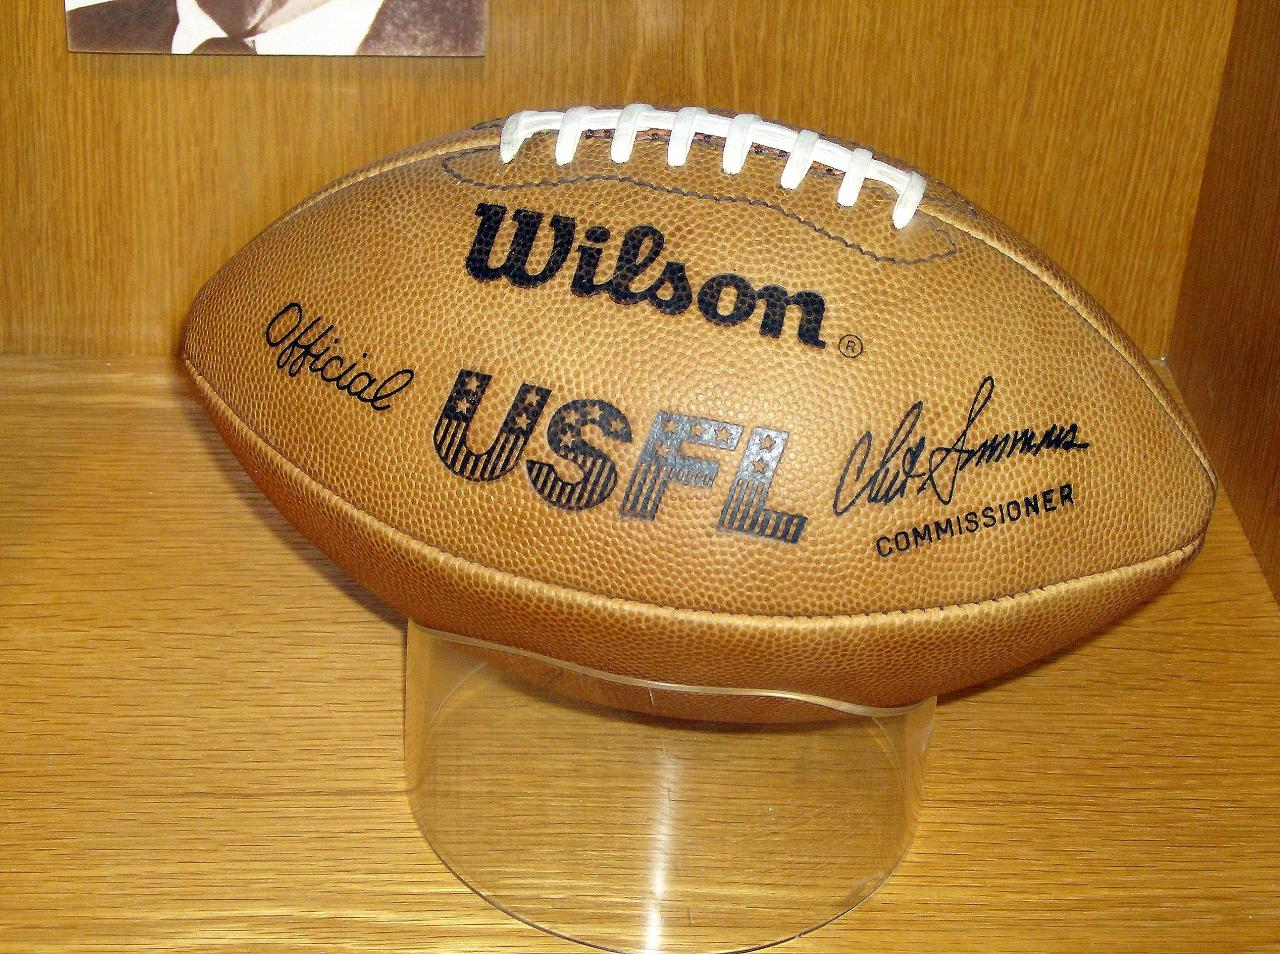 USFL Official Ball